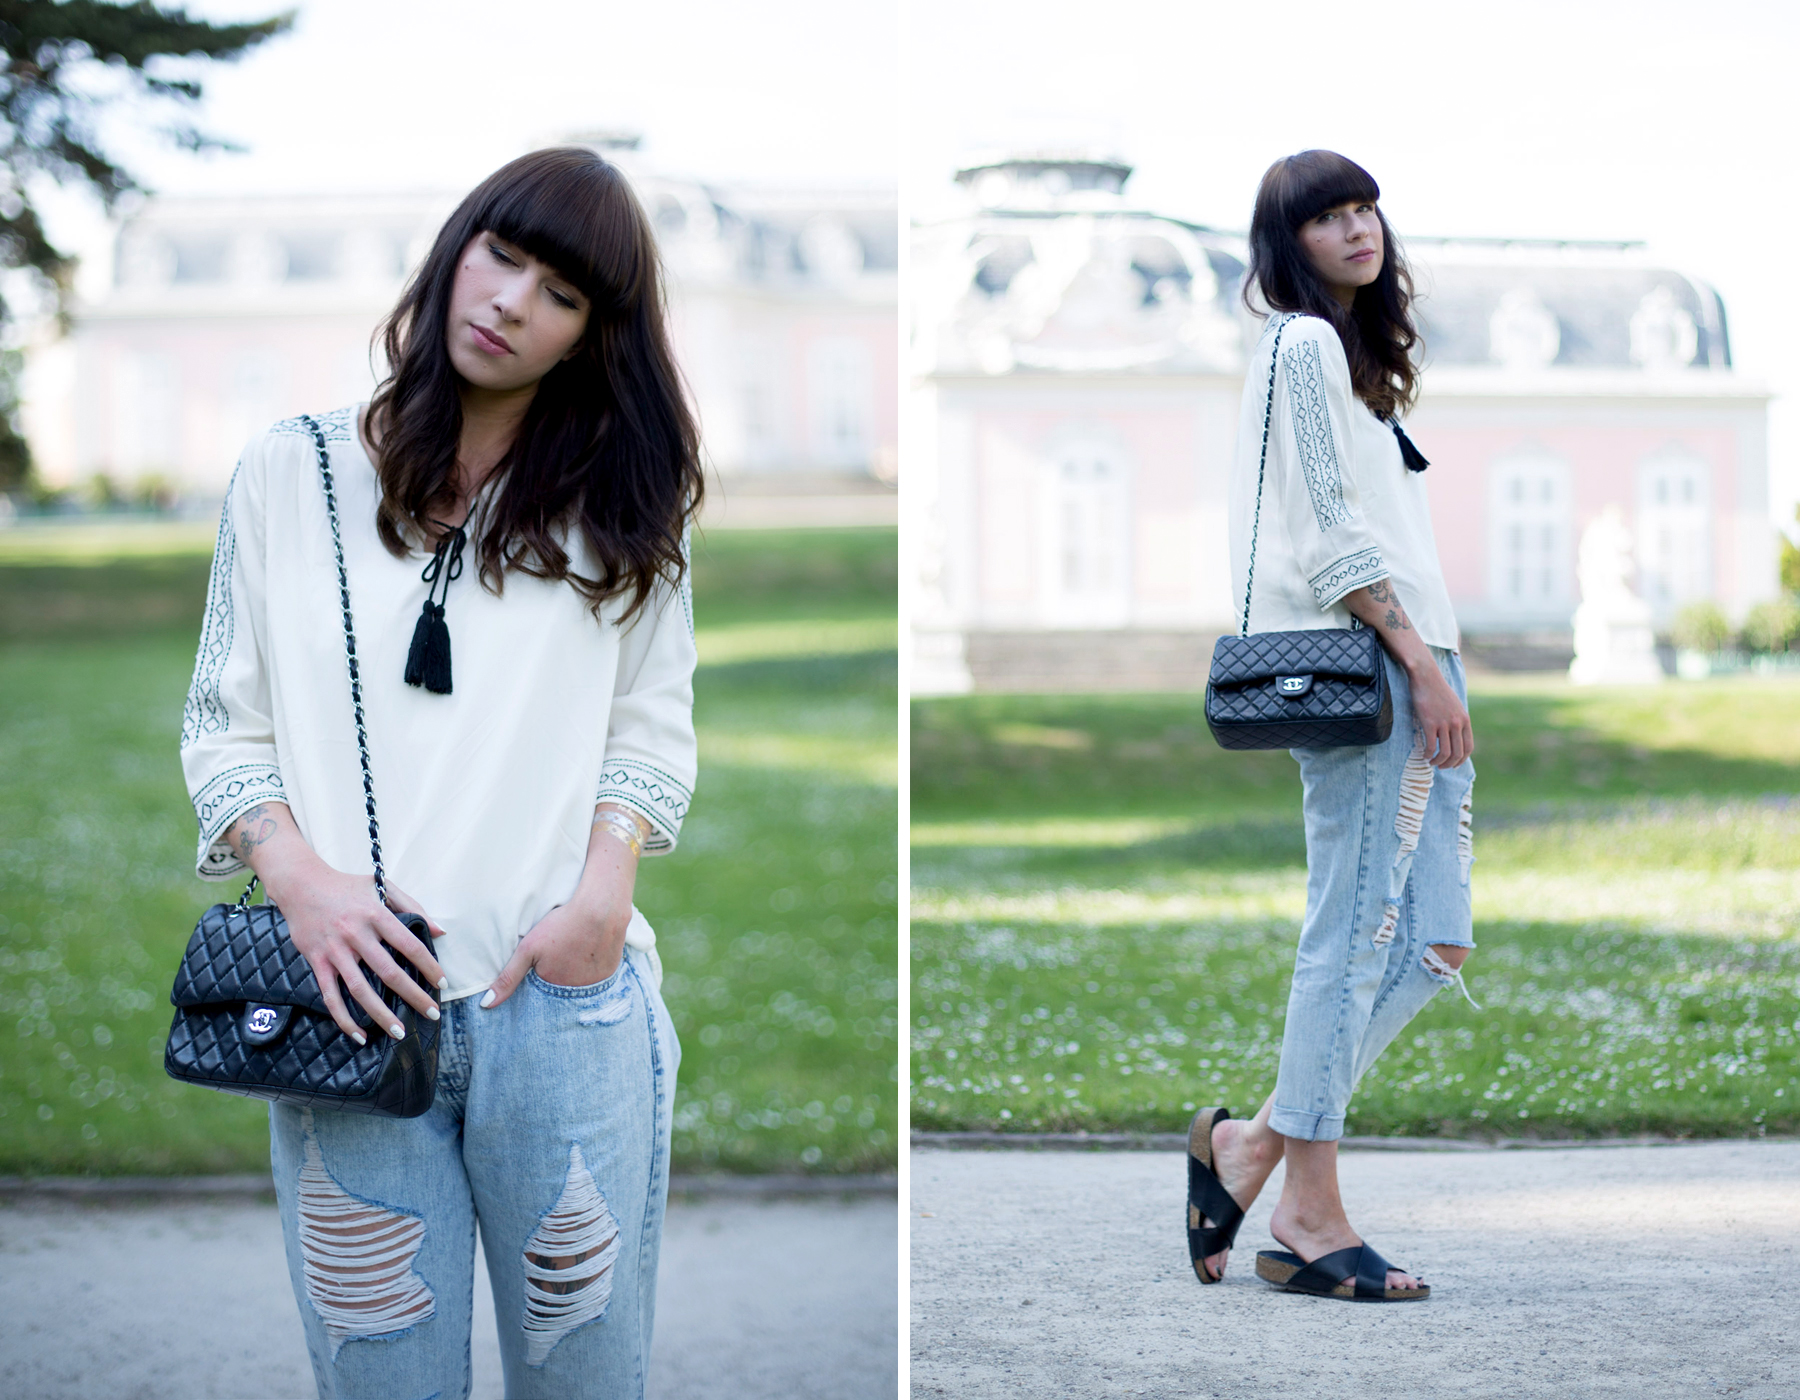 jeans girl ripped denim shopbop styling summer düsseldorf dusseldorf fashion blogger germany cats & dogs ricarda schernus 5